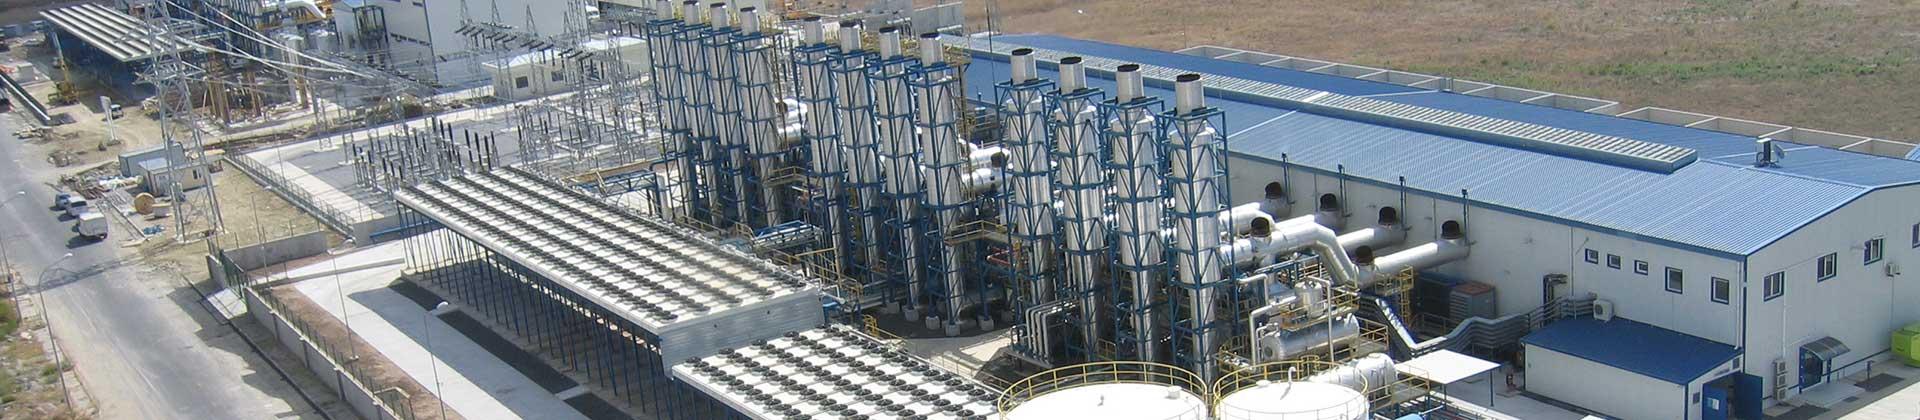 Aliaga power plant